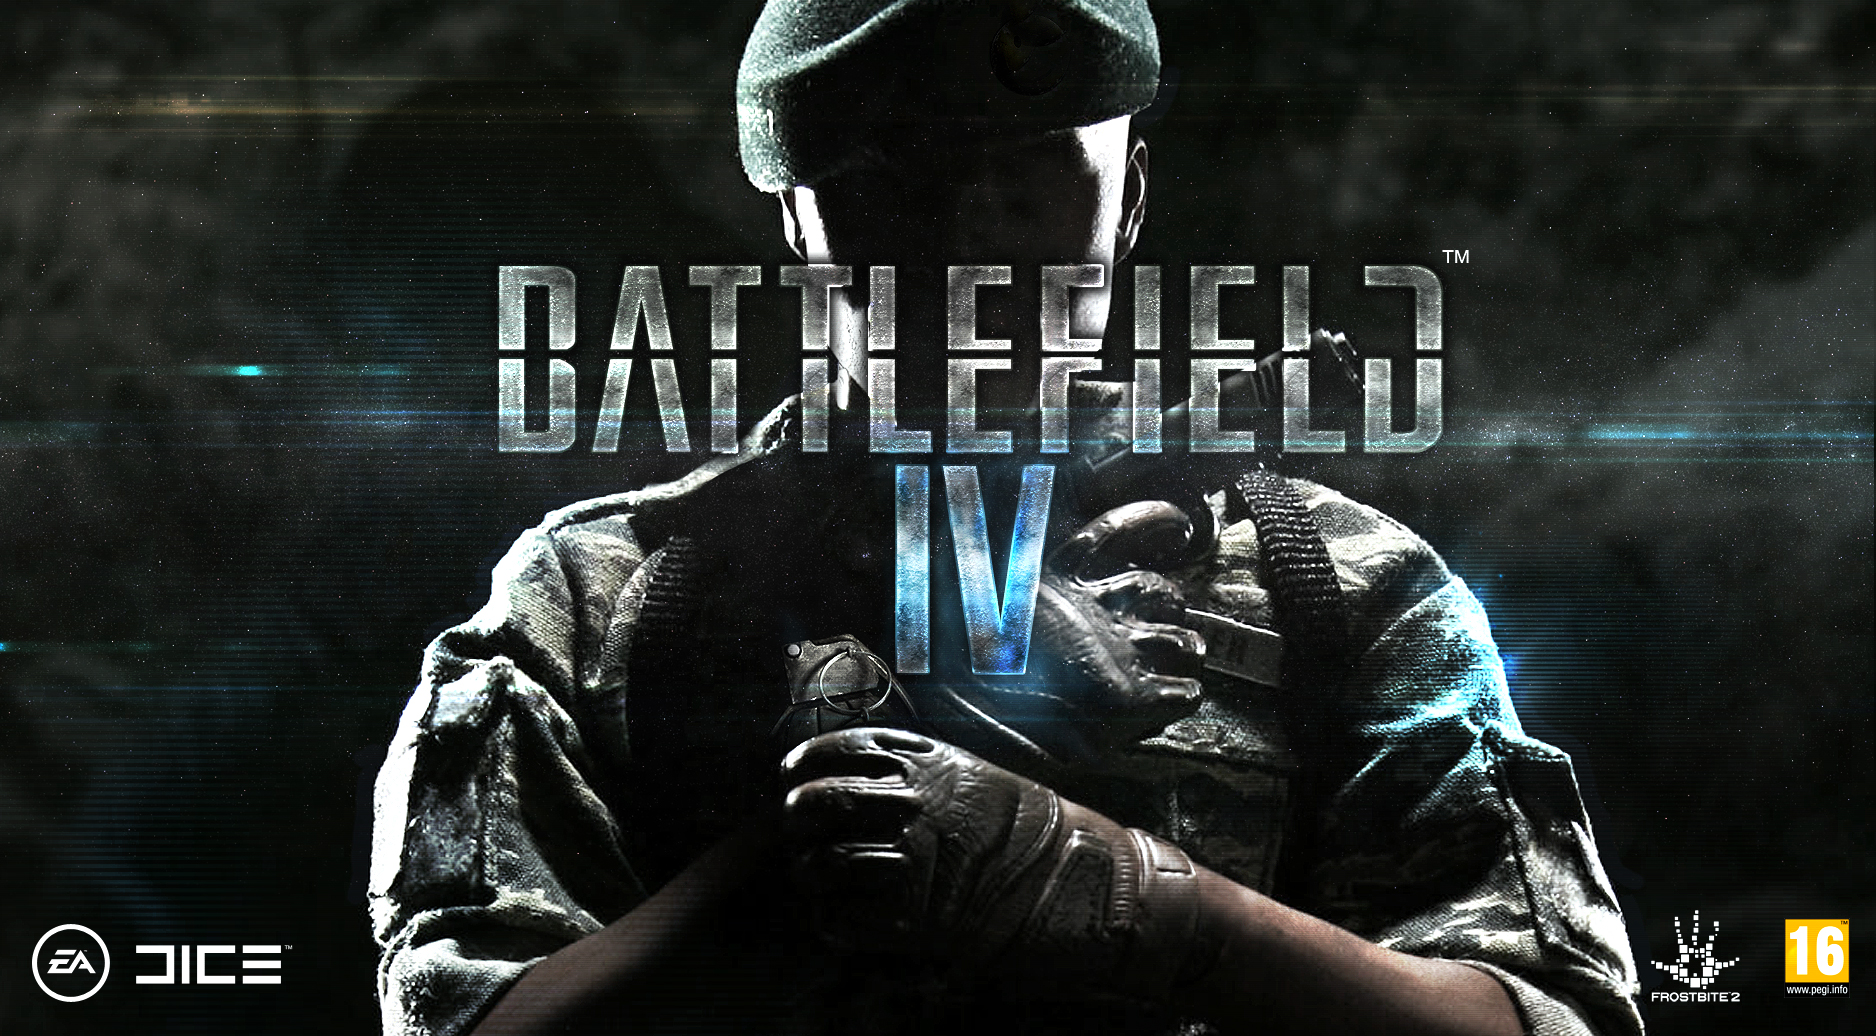 Battlefield 4 Wallpaper By Muusedesign On Deviantart